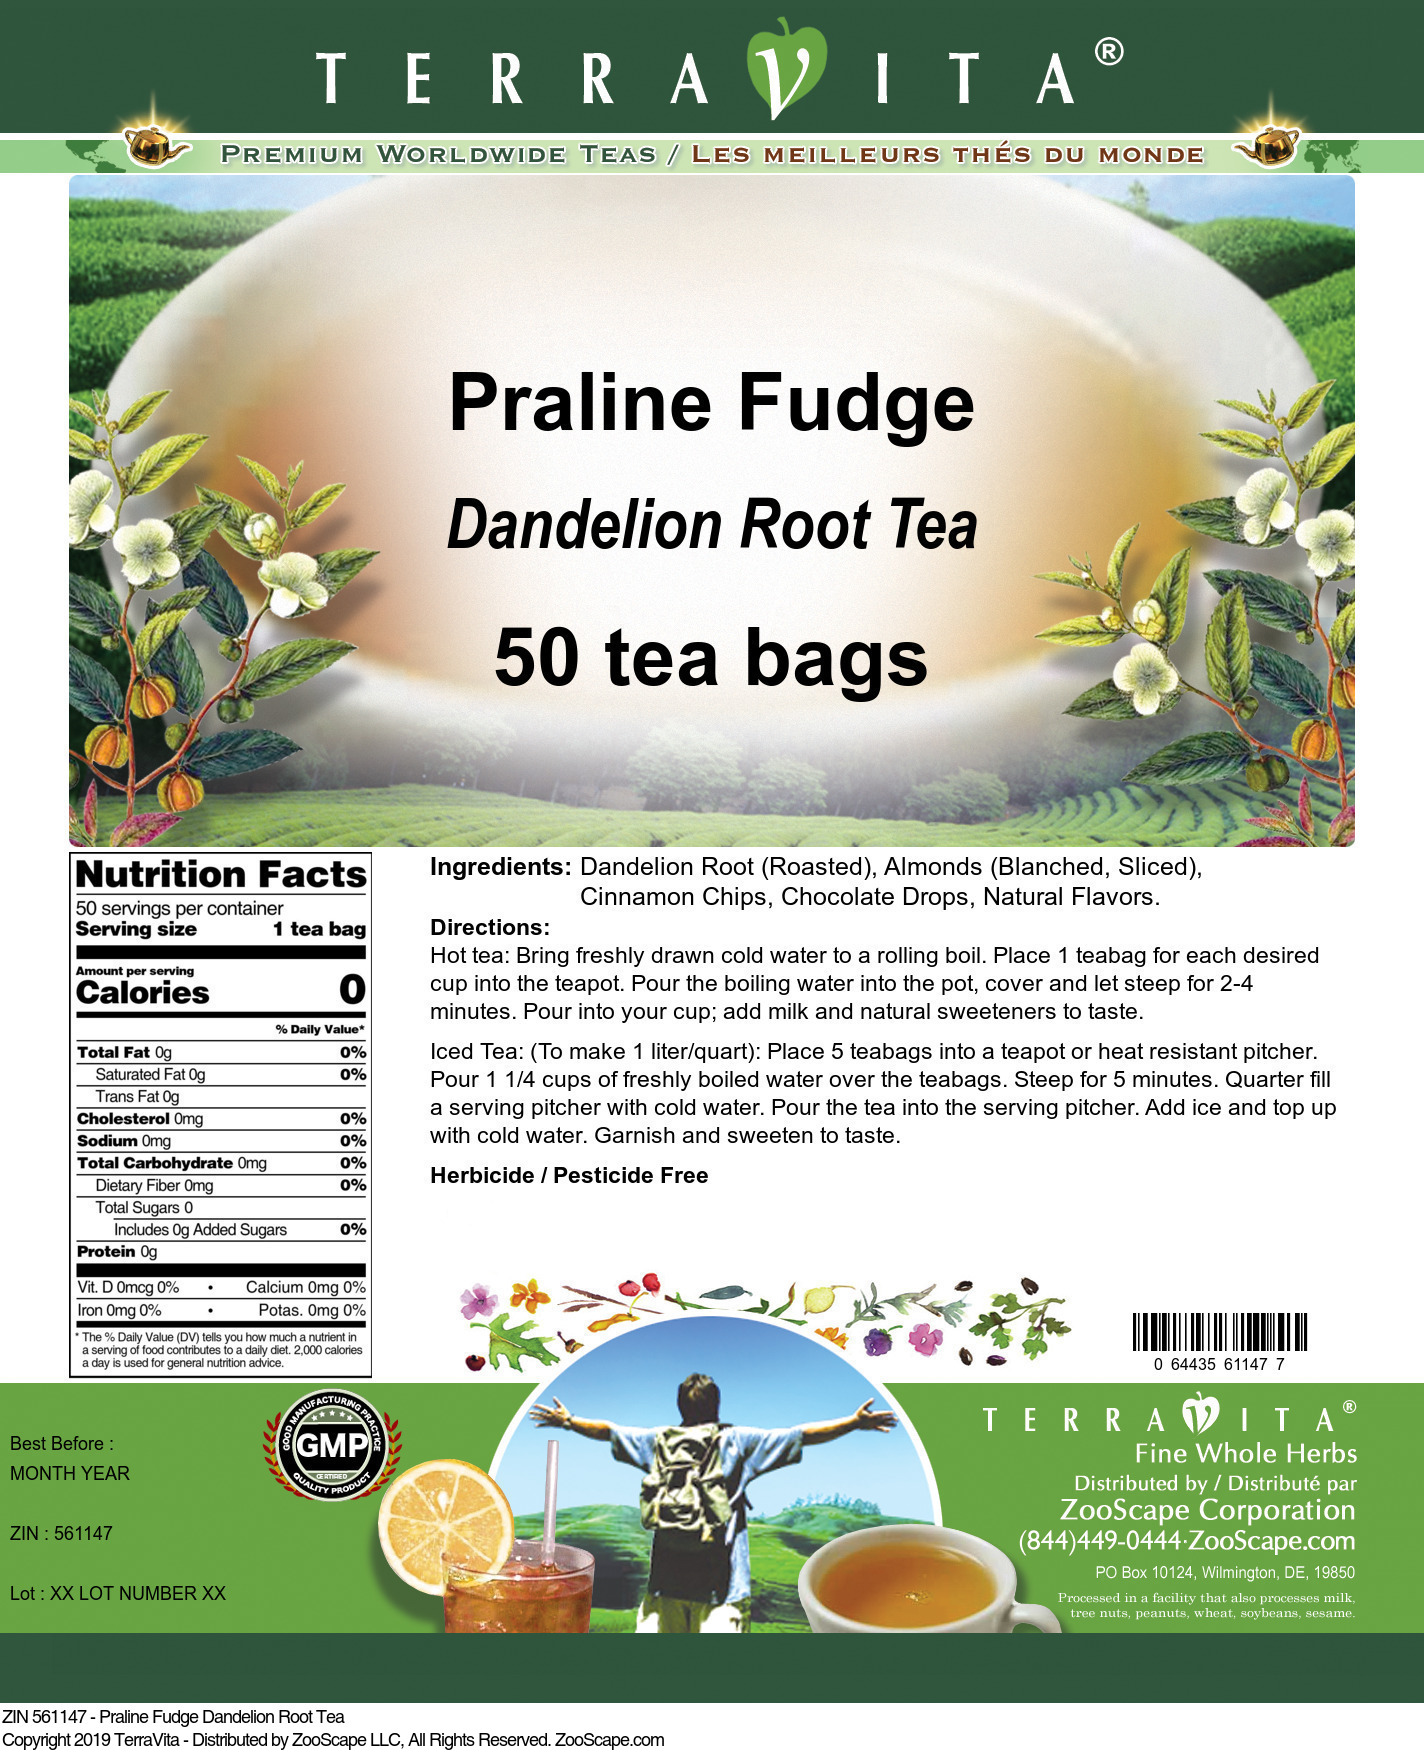 Praline Fudge Dandelion Root